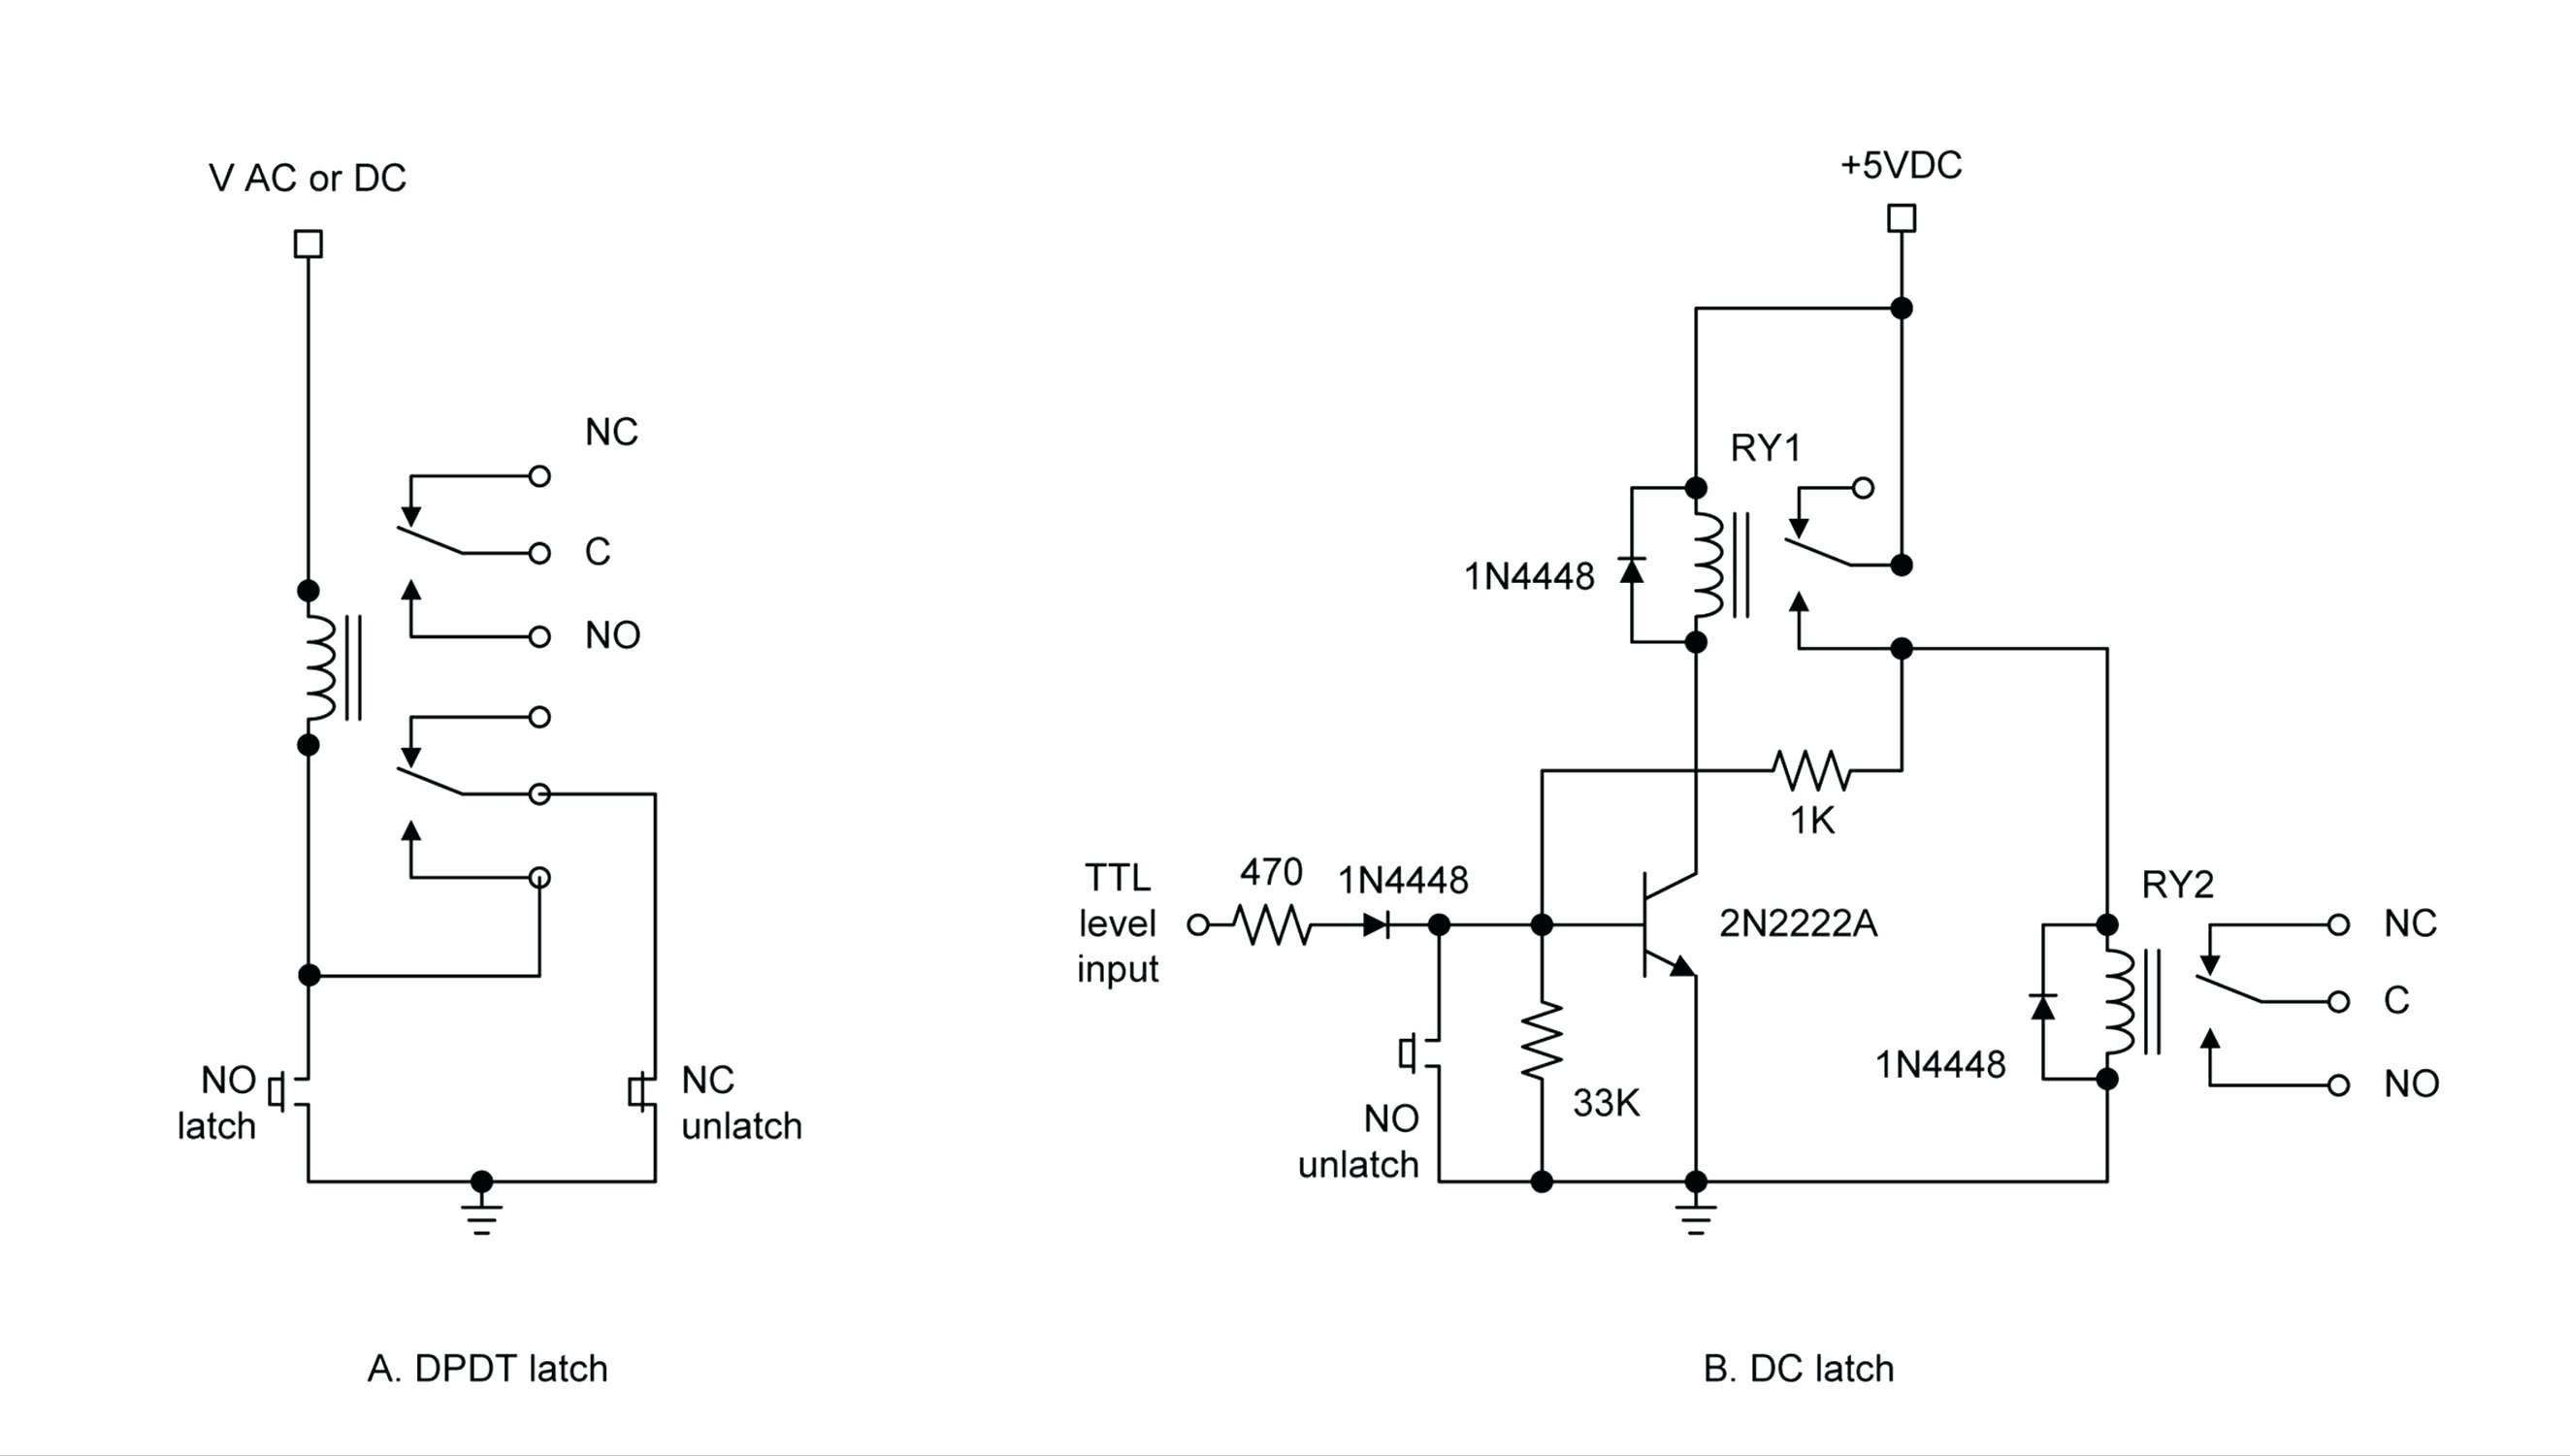 solar car circuit diagram best car horn wiring diagram irelandnews rh detoxicrecenze com Solar Power Installation Diagram Solar Wiring Diagrams for Homes